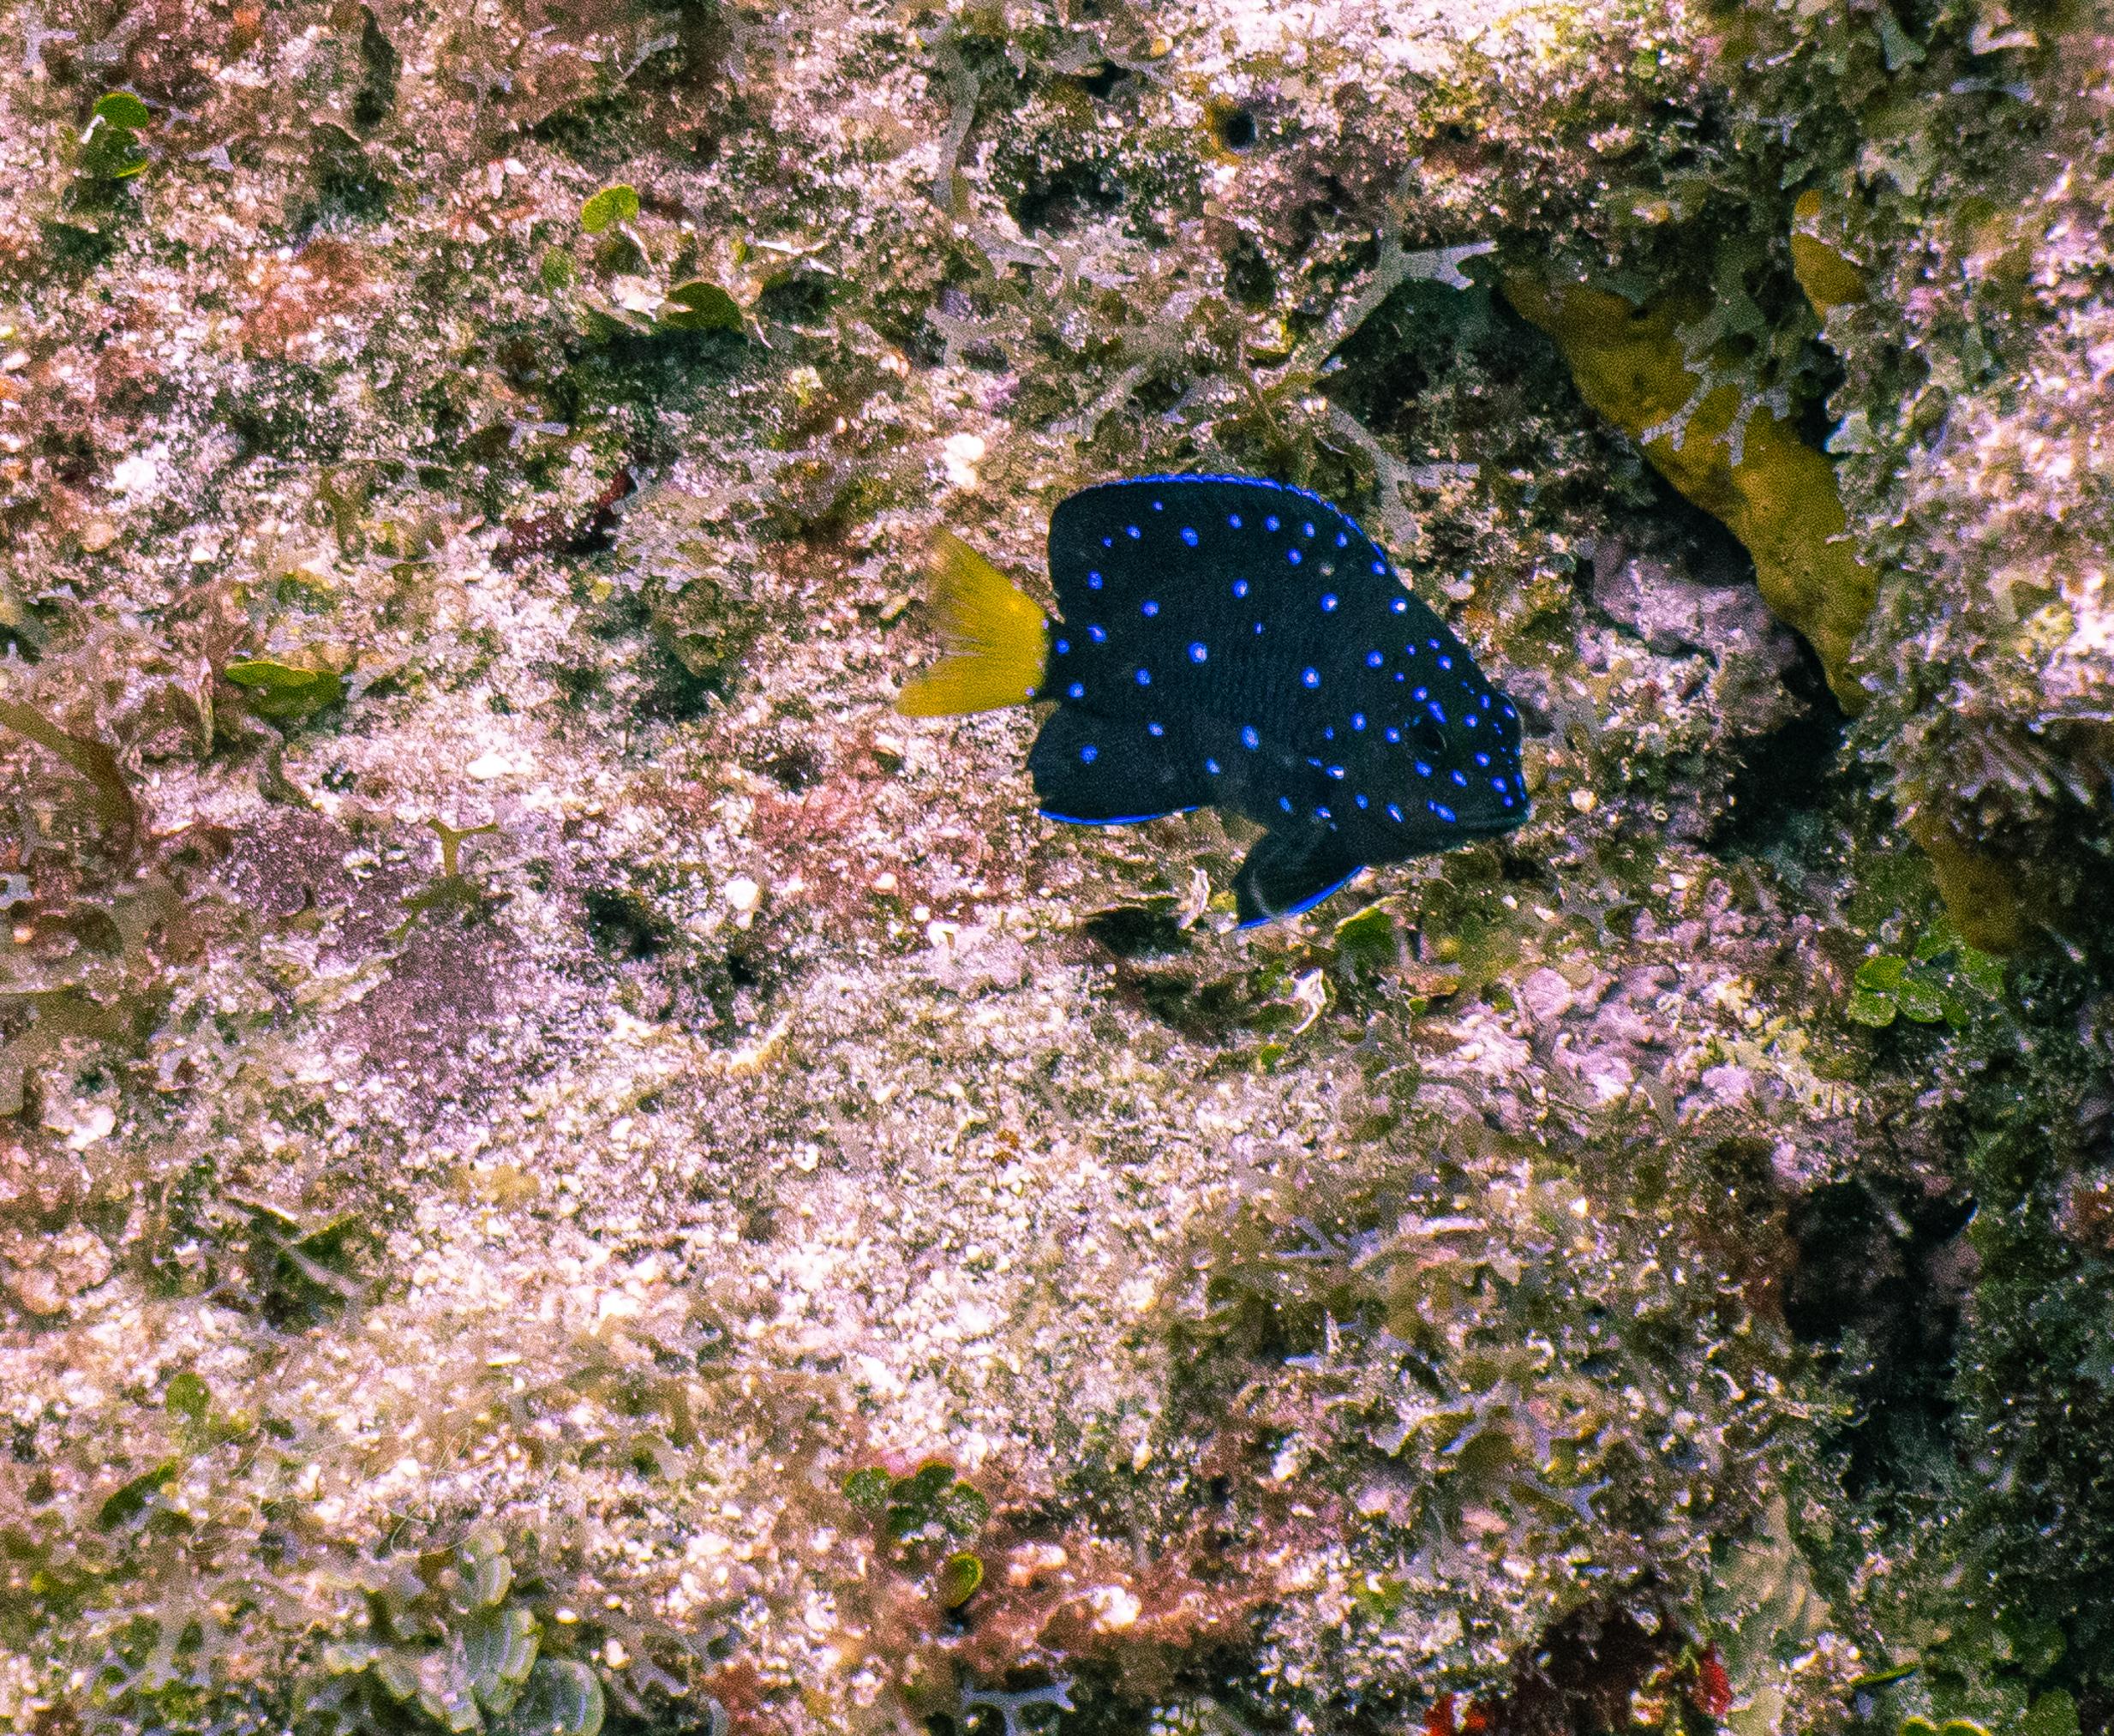 Maturing-Yellowtail-Damselfish-5185